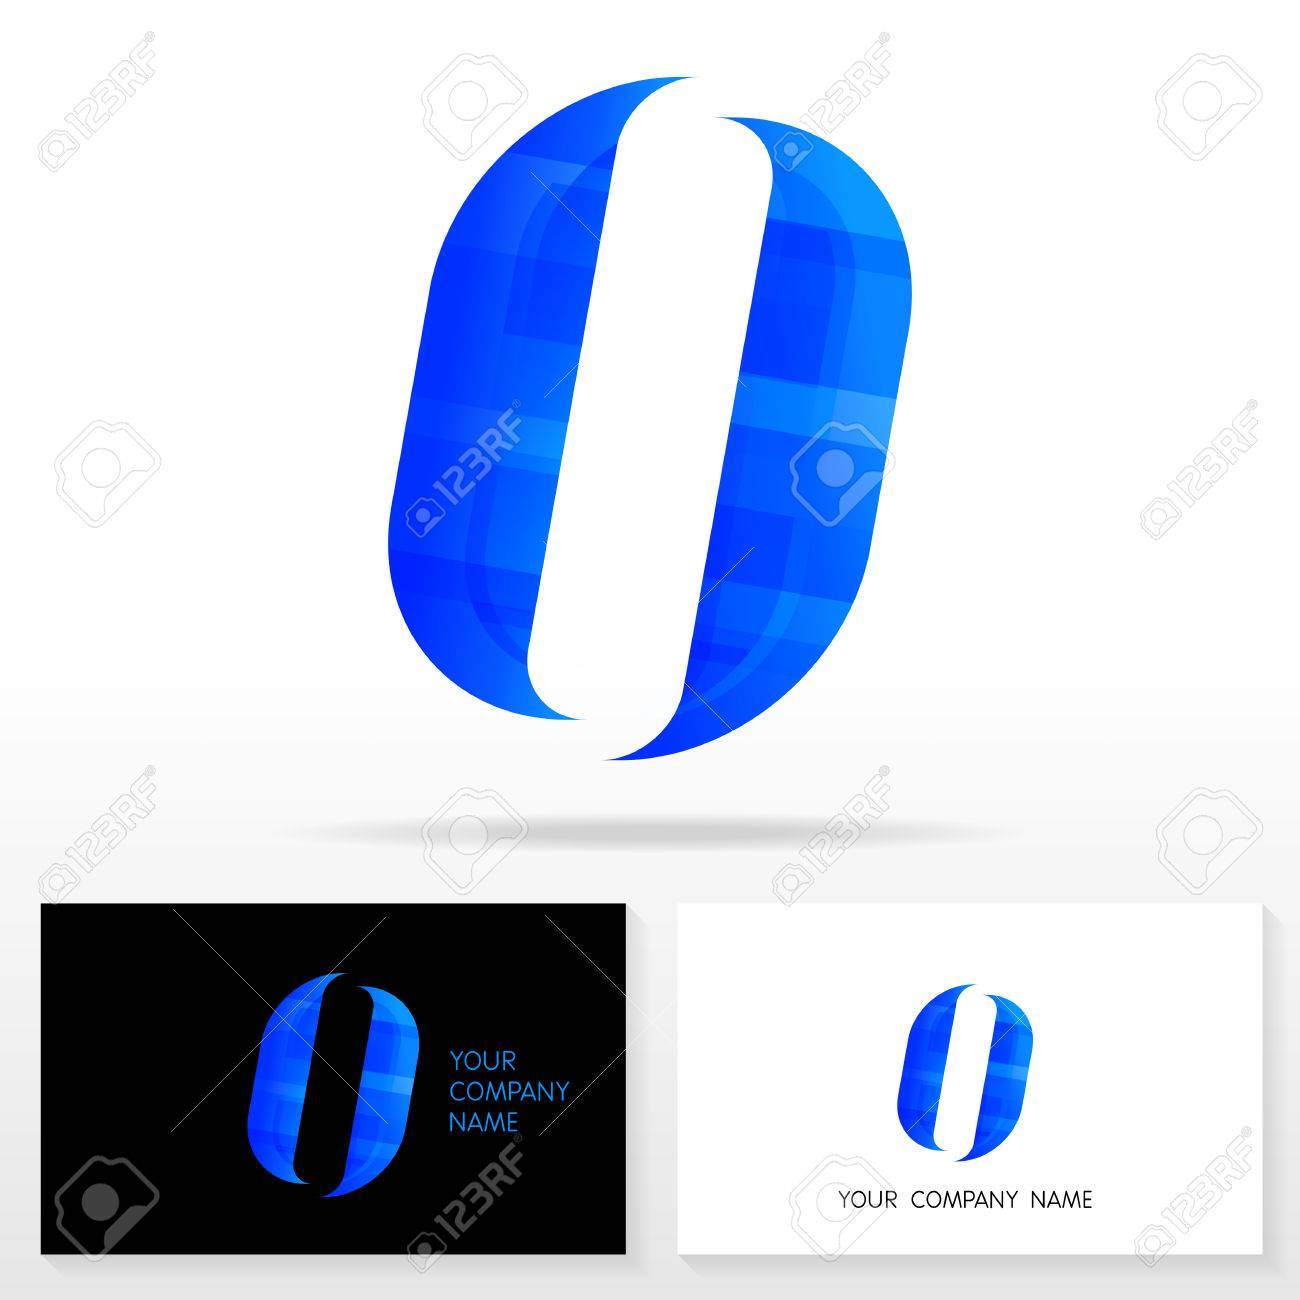 letter o logo design business vector sign business card templates